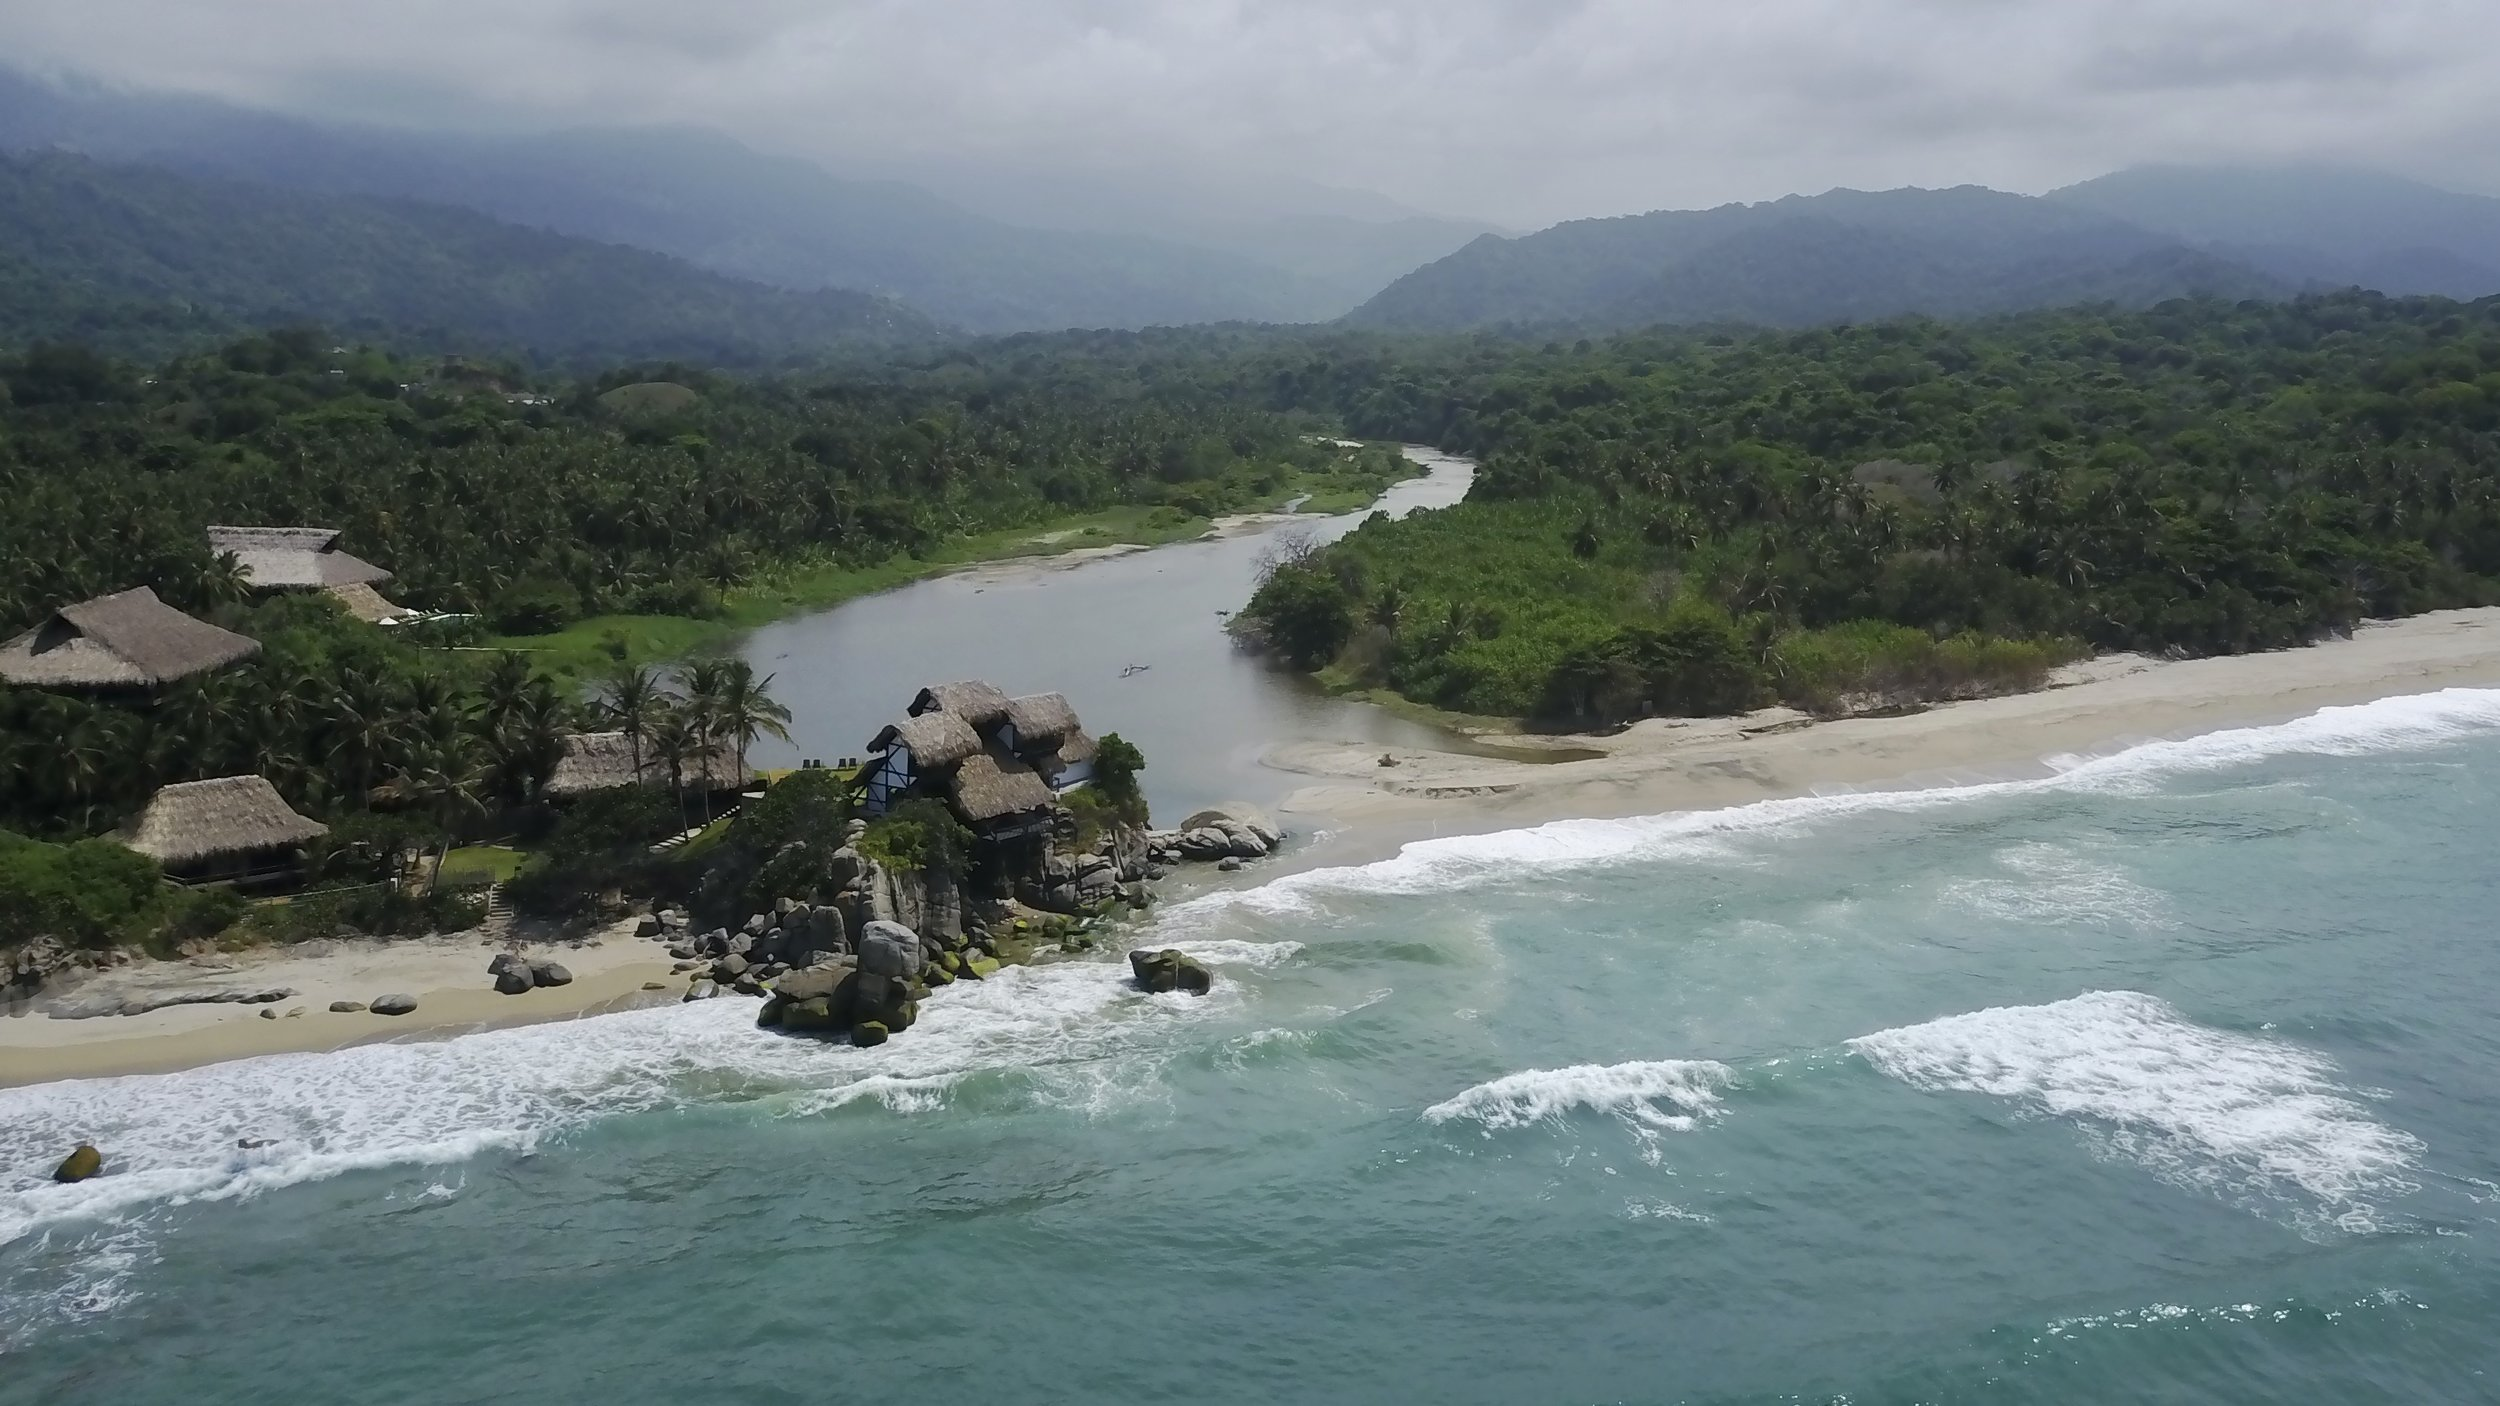 Finca Barlovento, Los Naranjos, Colombia, a review by Across Land & Sea